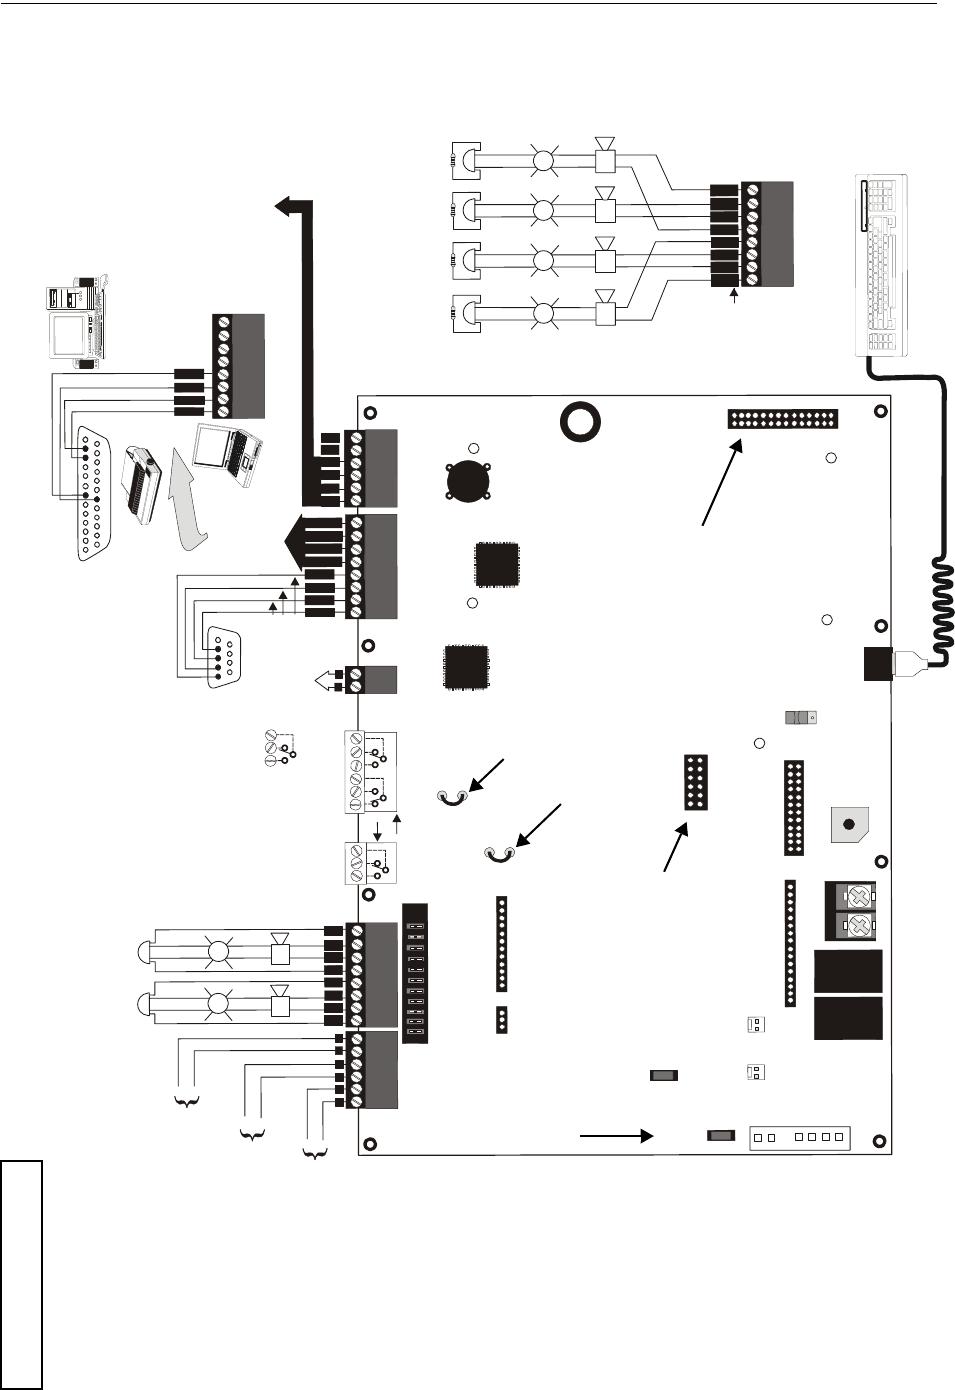 Honeywell Smoke Alarm Ms 9600Ls Users Manual 52646